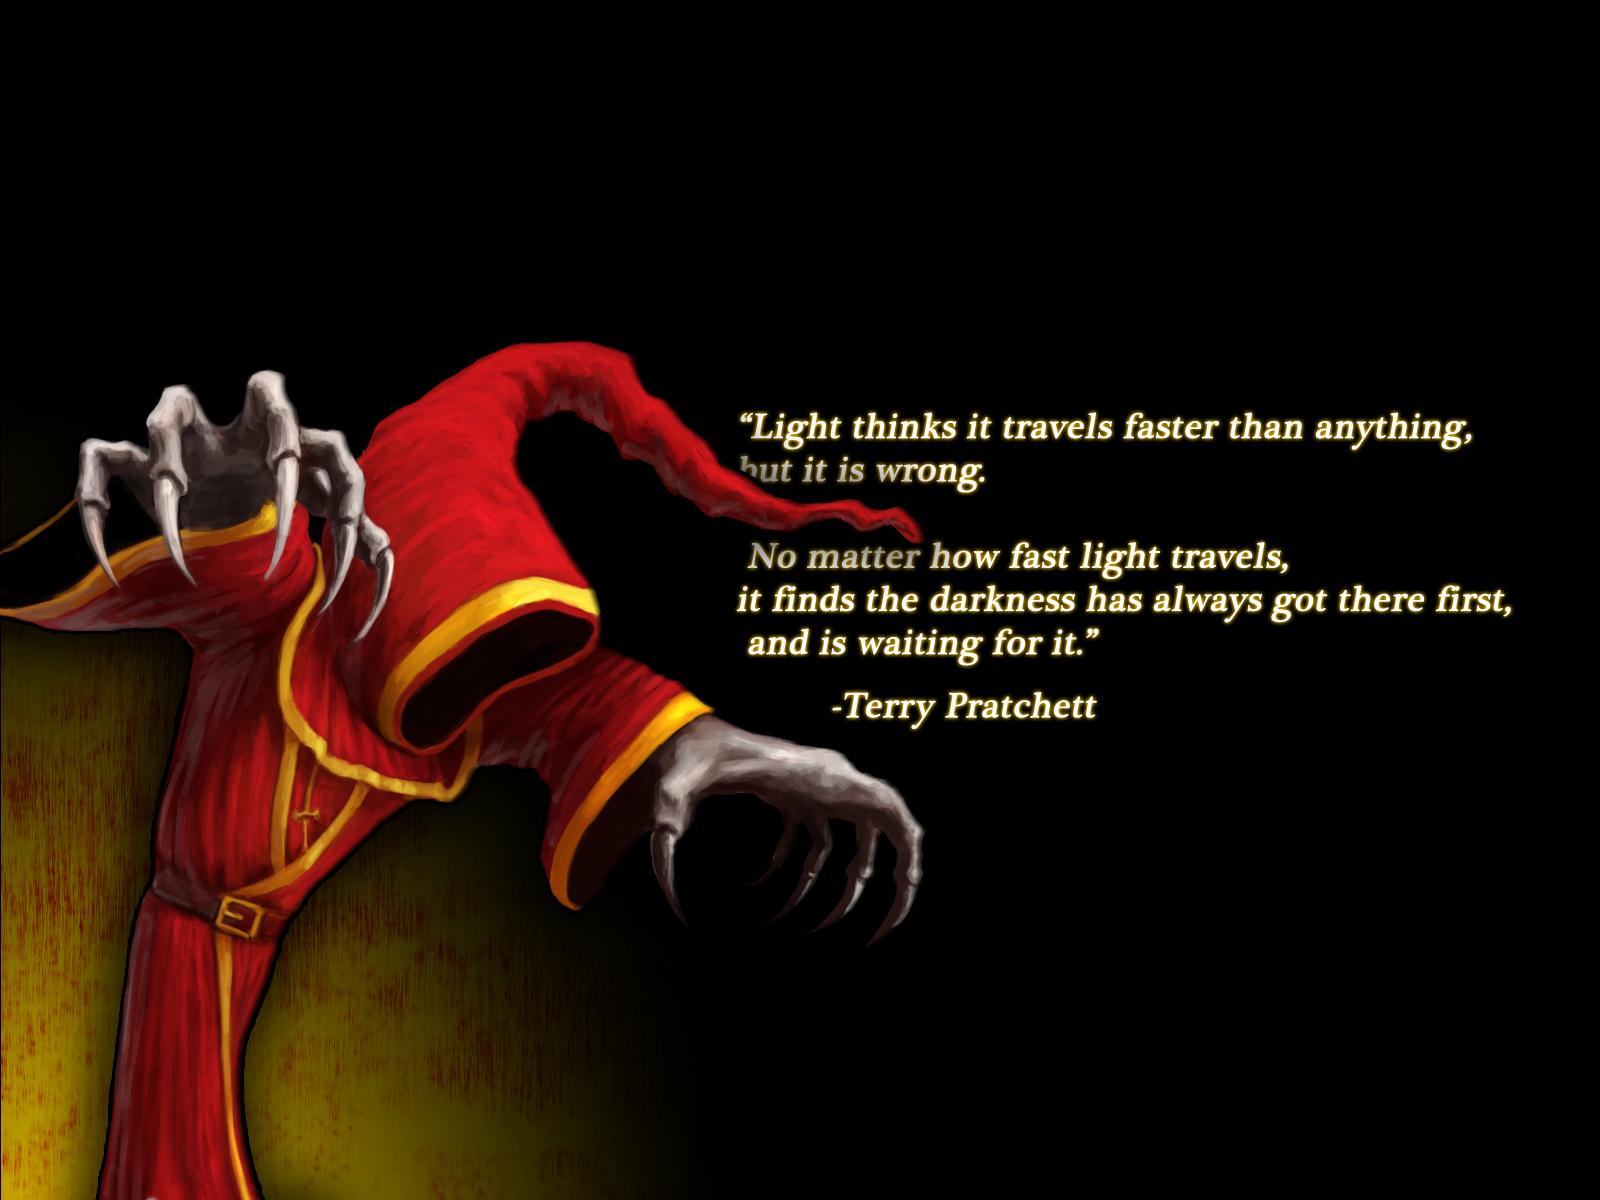 Terry Pratchett Black Light Darkness Creepy fantasy league legends 1600x1200